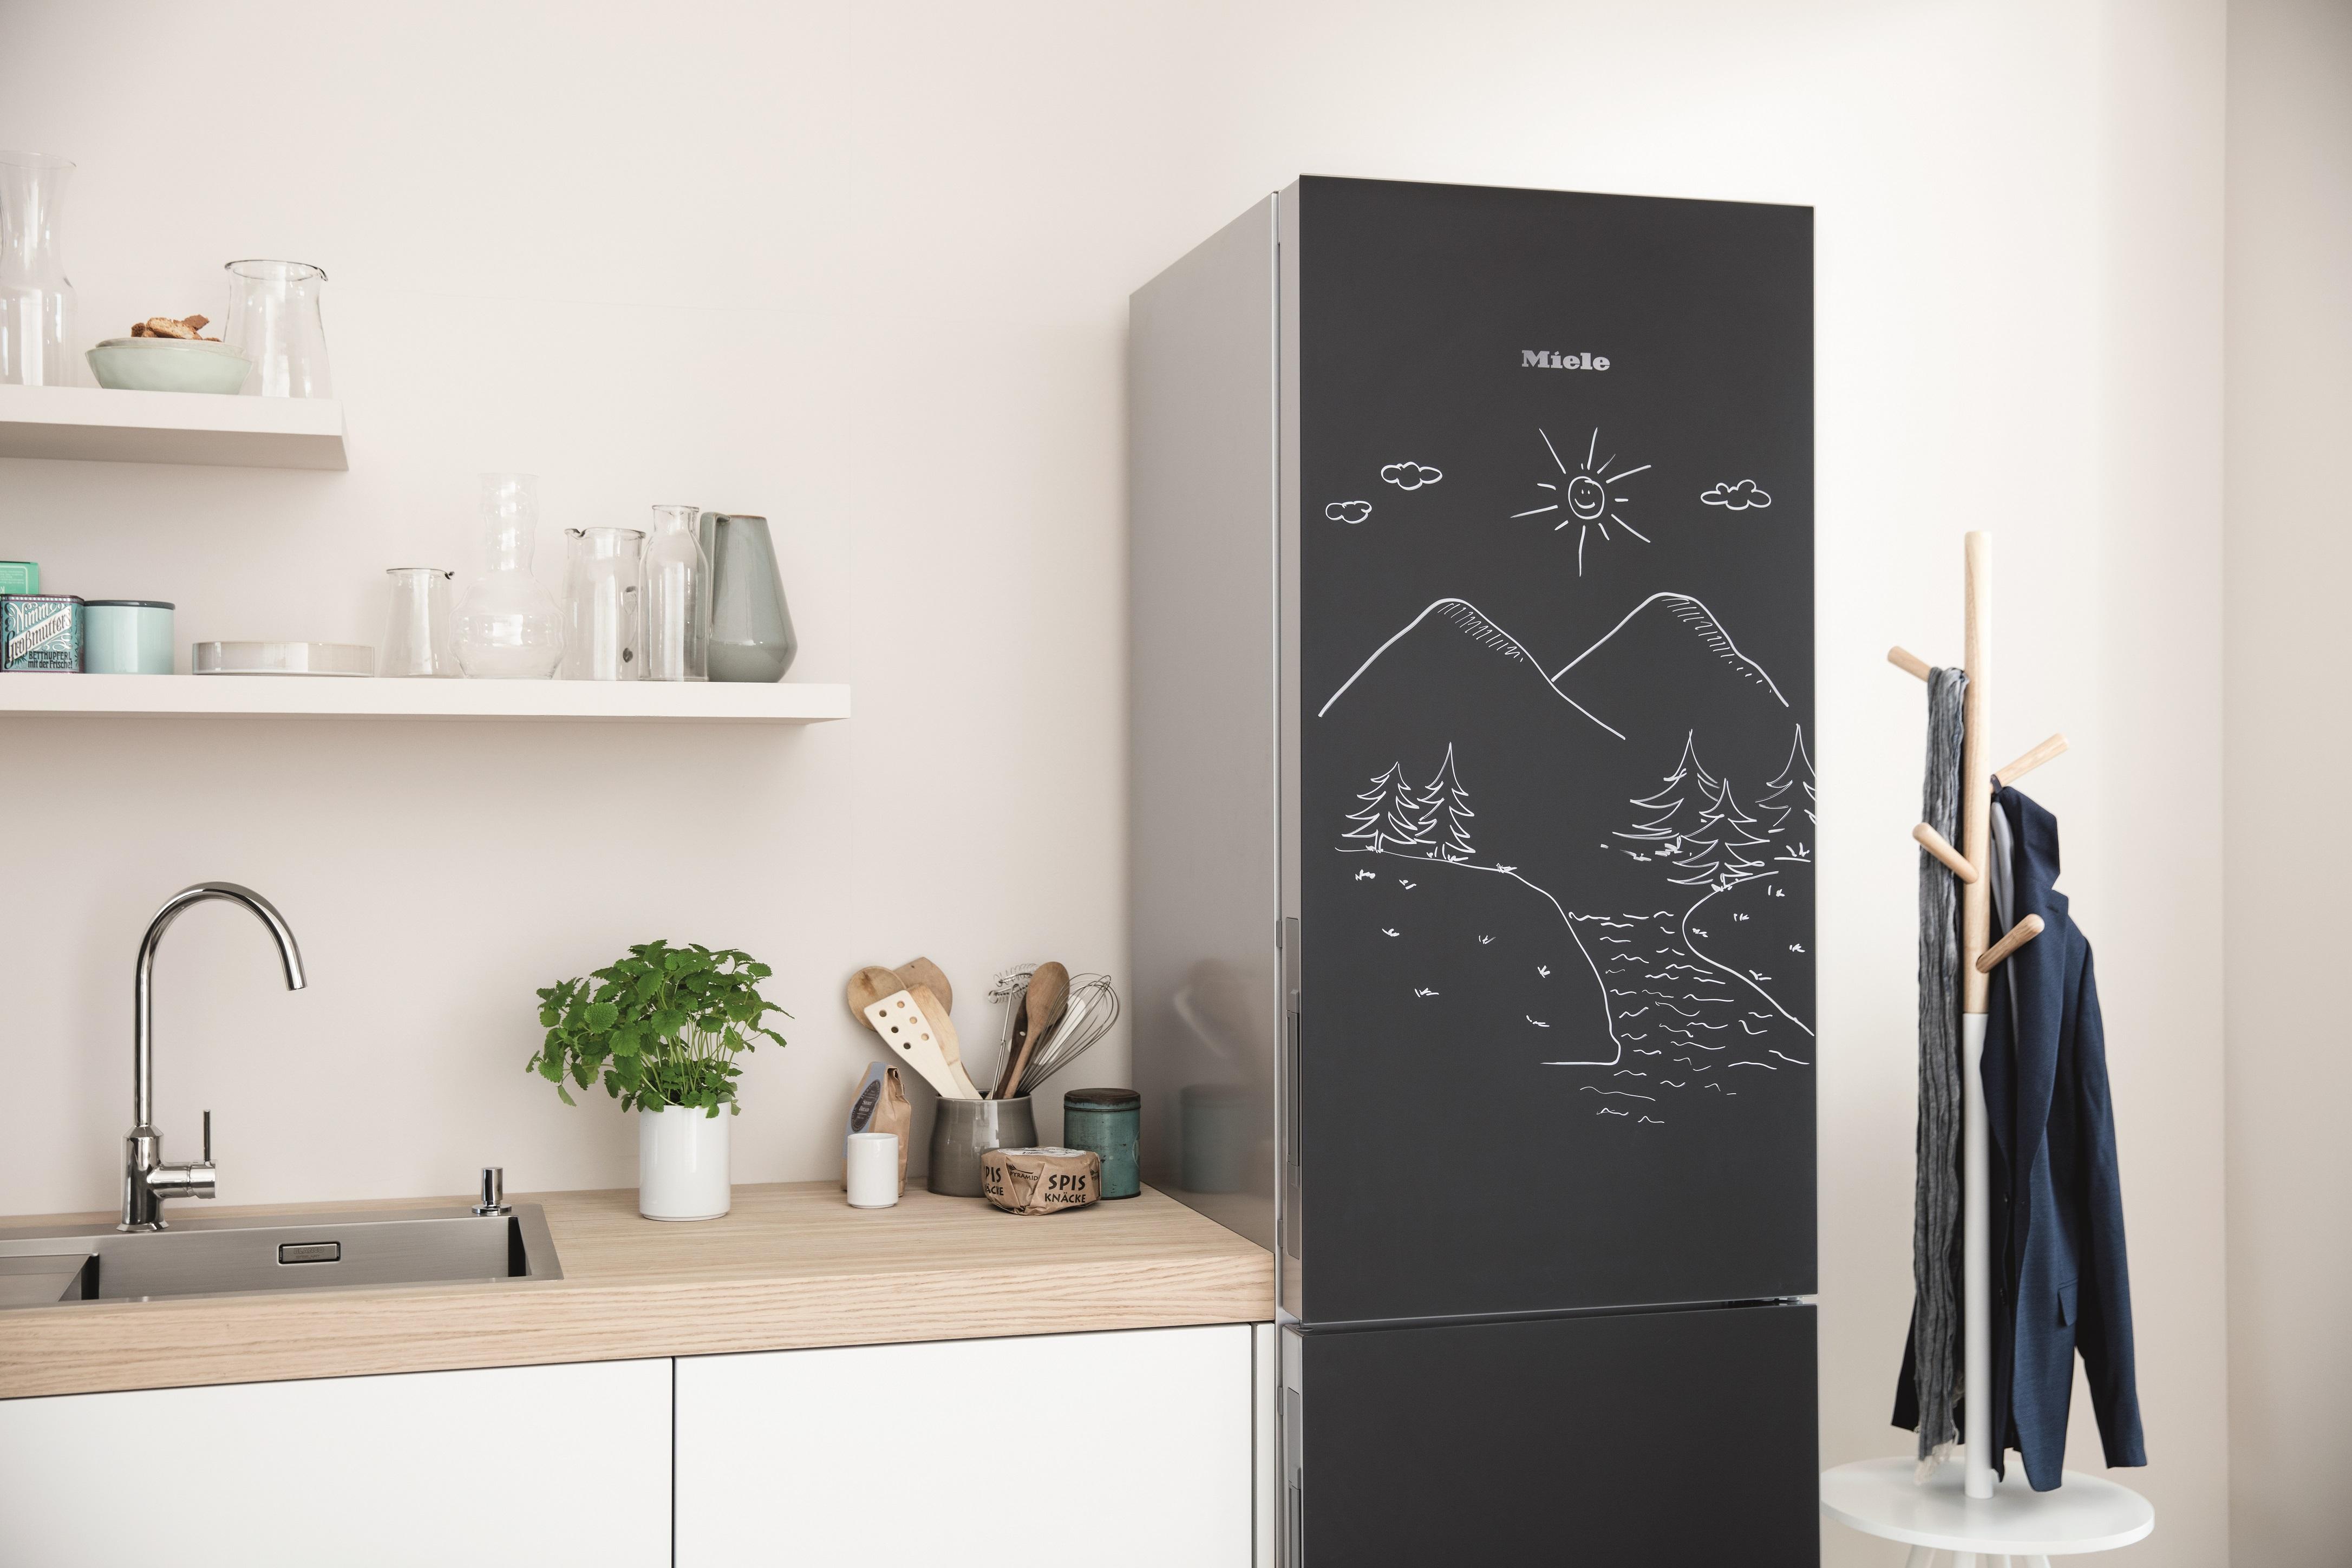 The cold versatility - HA Household Appliances - Parts & Components